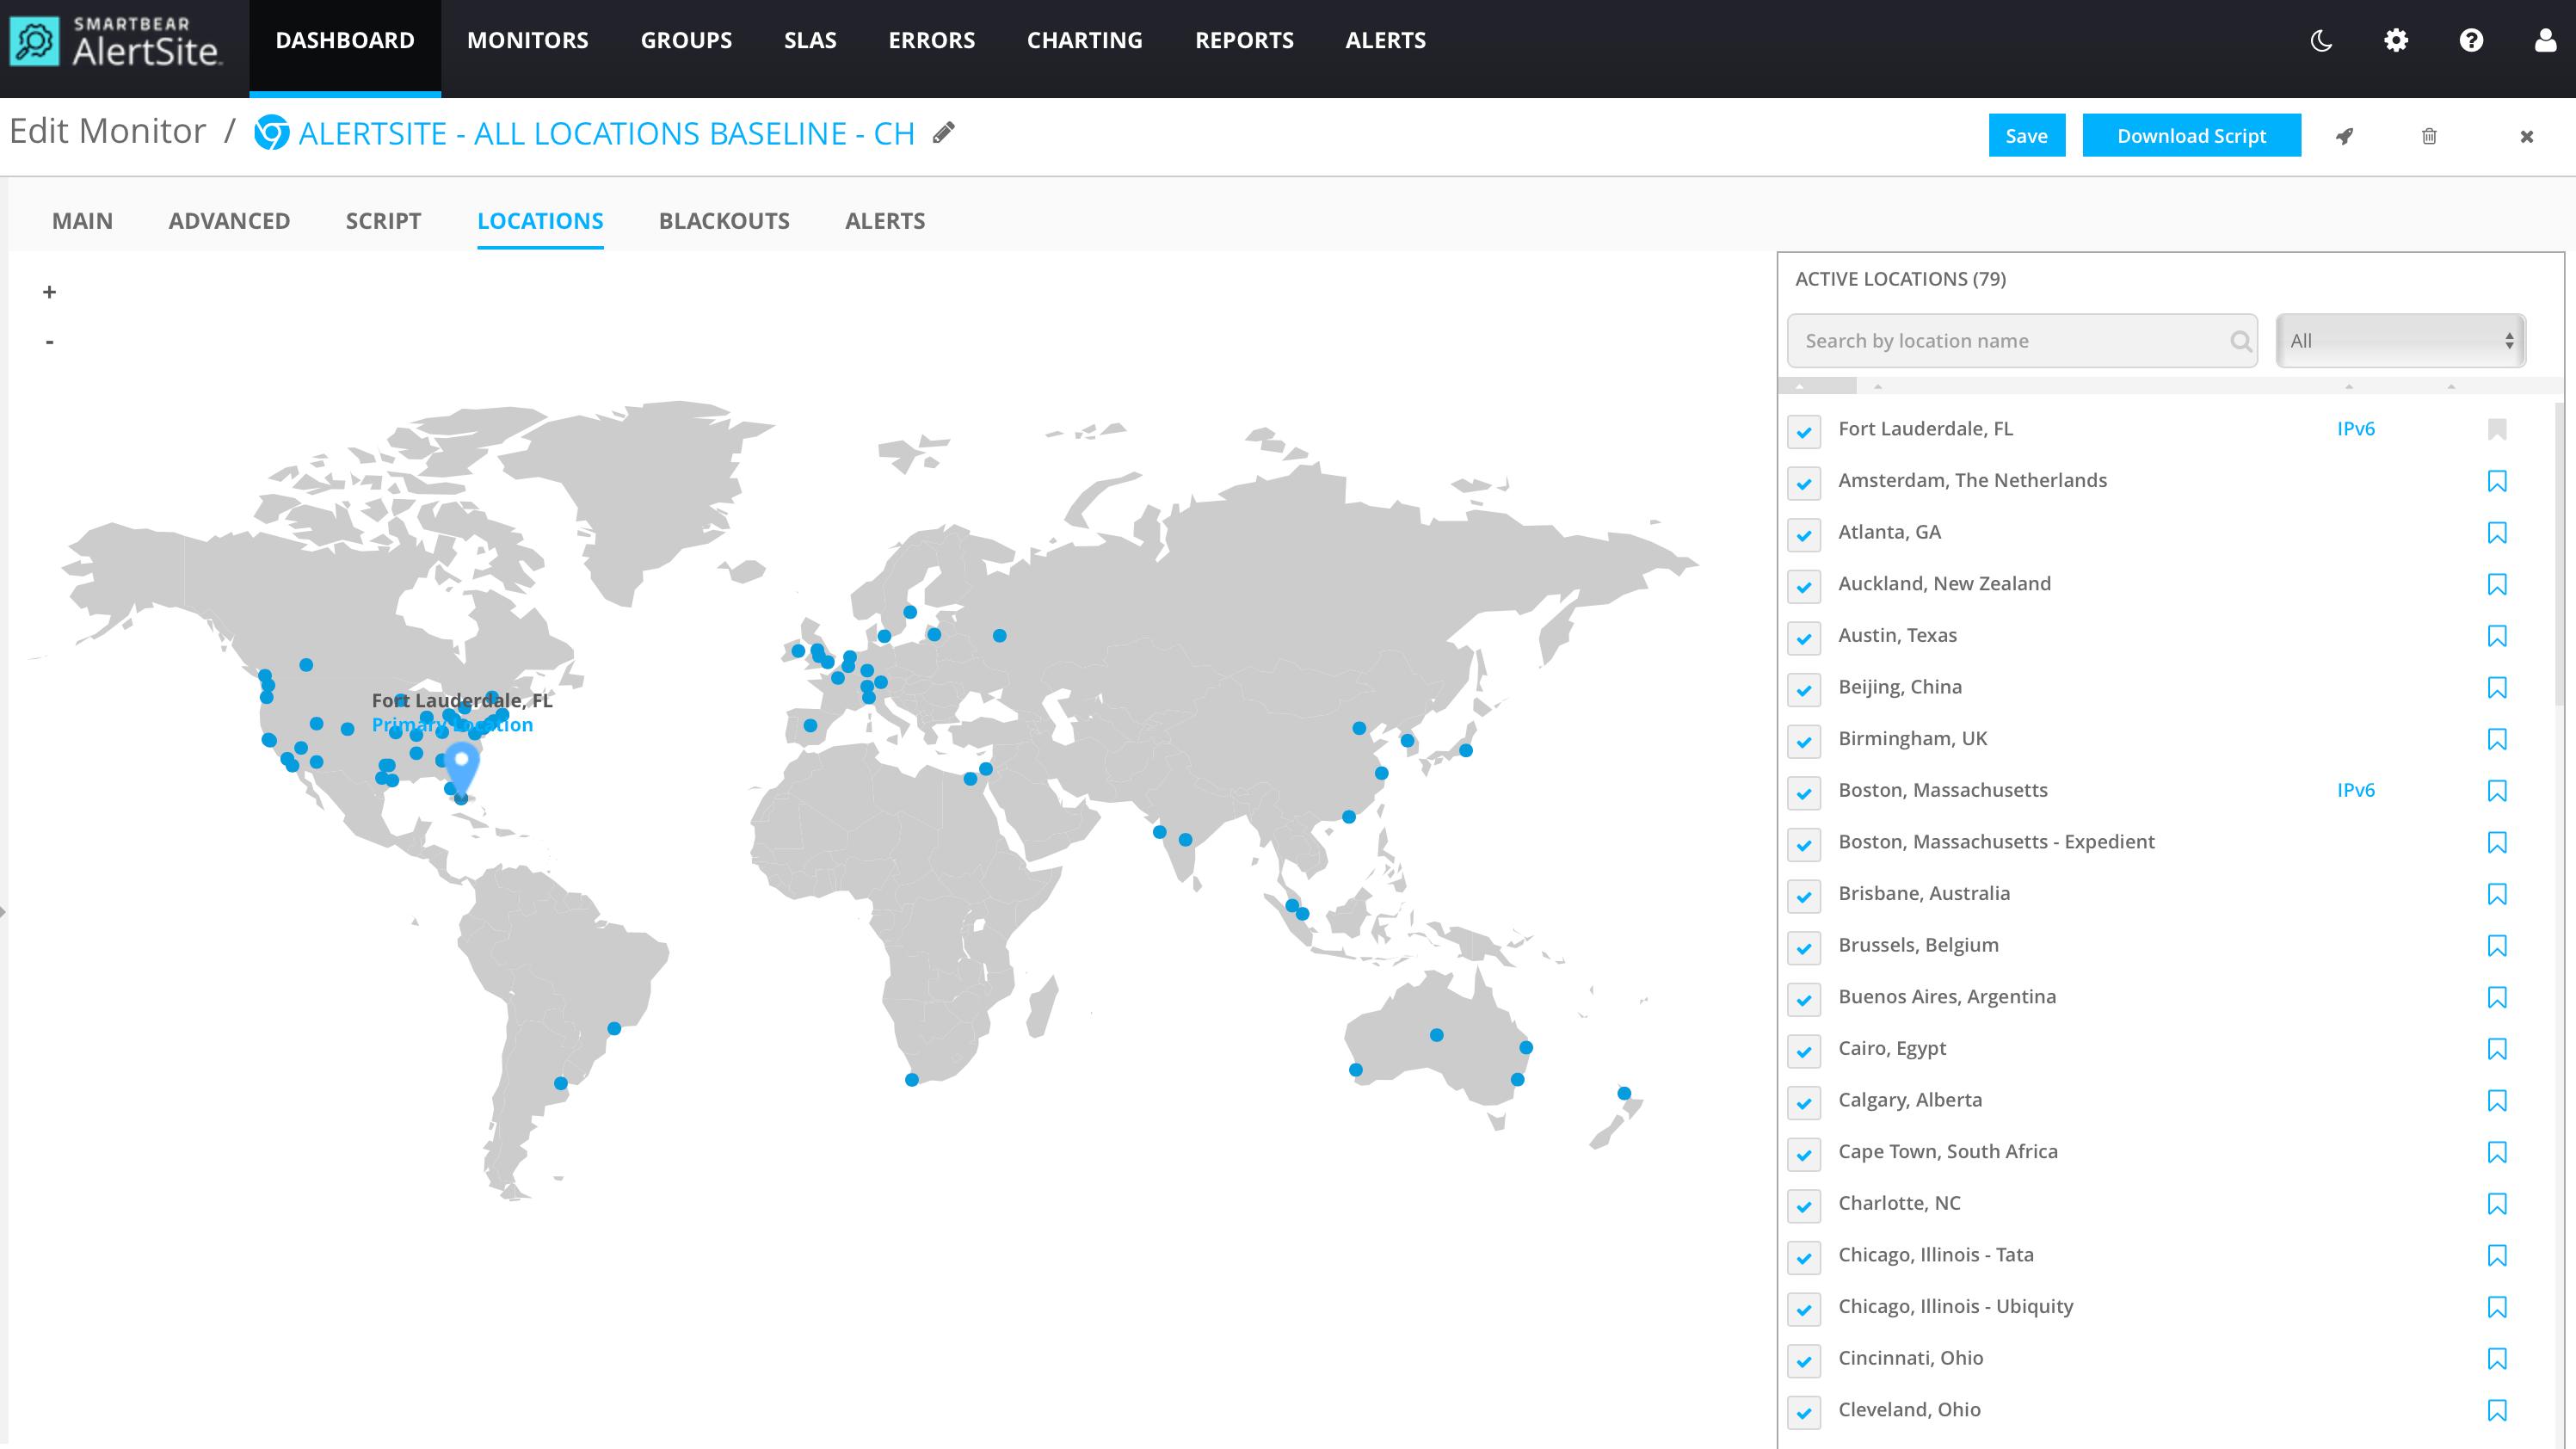 SmartBear AlertSite dashboard